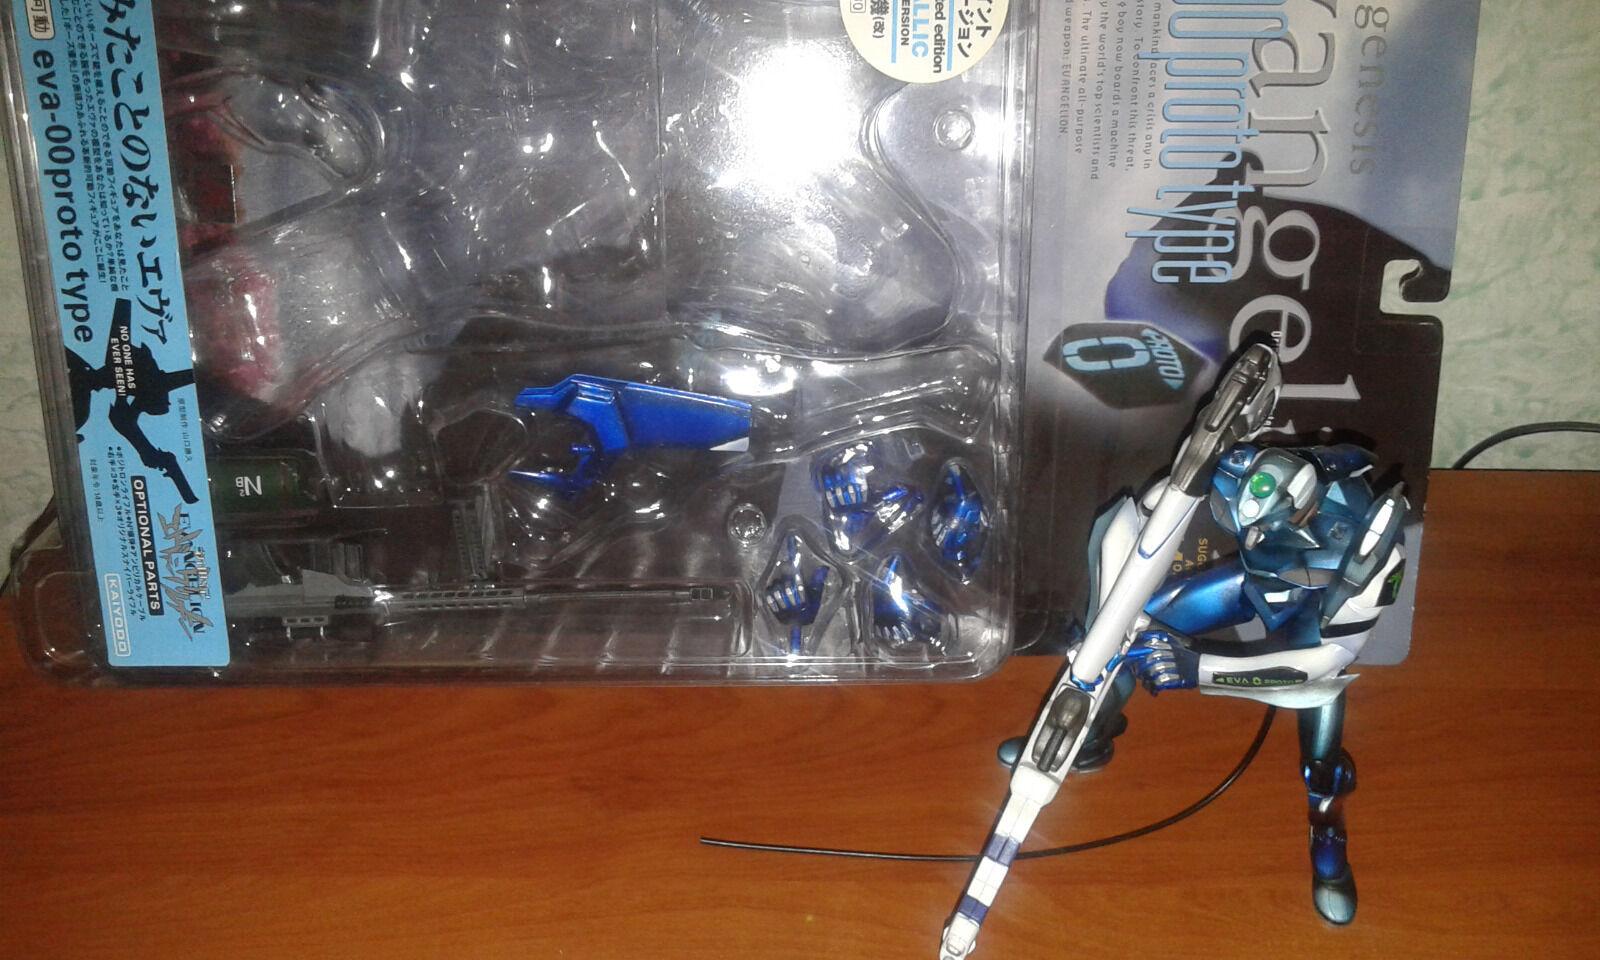 Neon Genesis  Evangelion 00 kaiyodo Mettuttiic Version  più economico